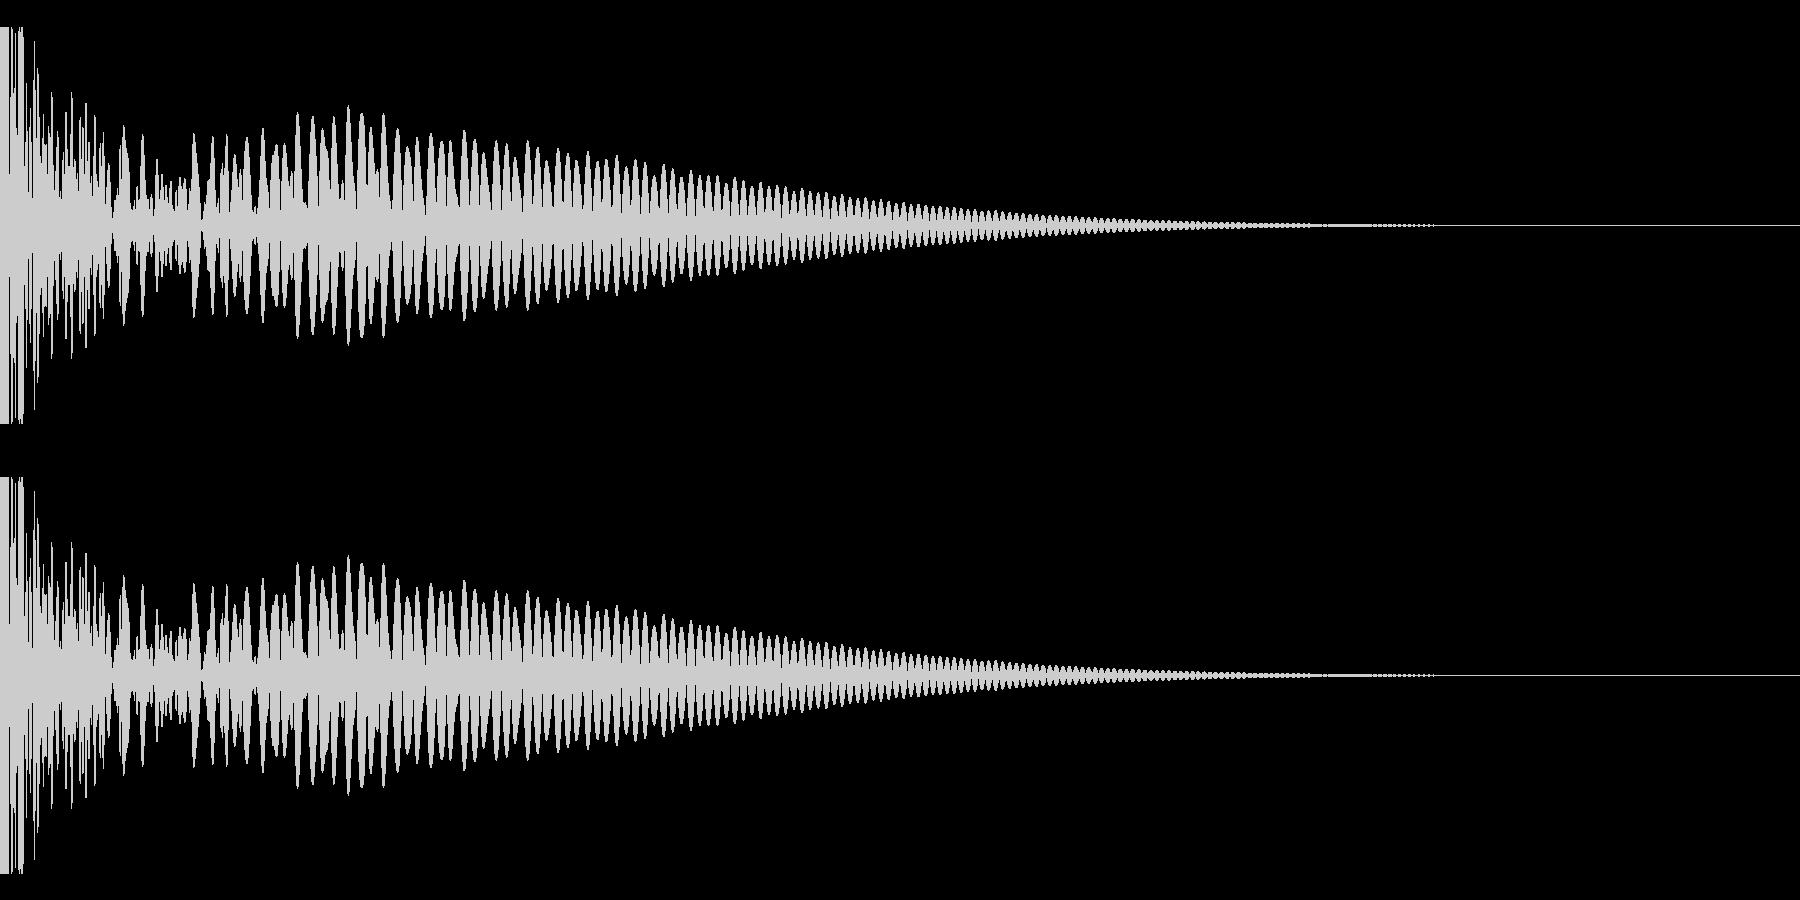 DTM Tom 34 オリジナル音源の未再生の波形